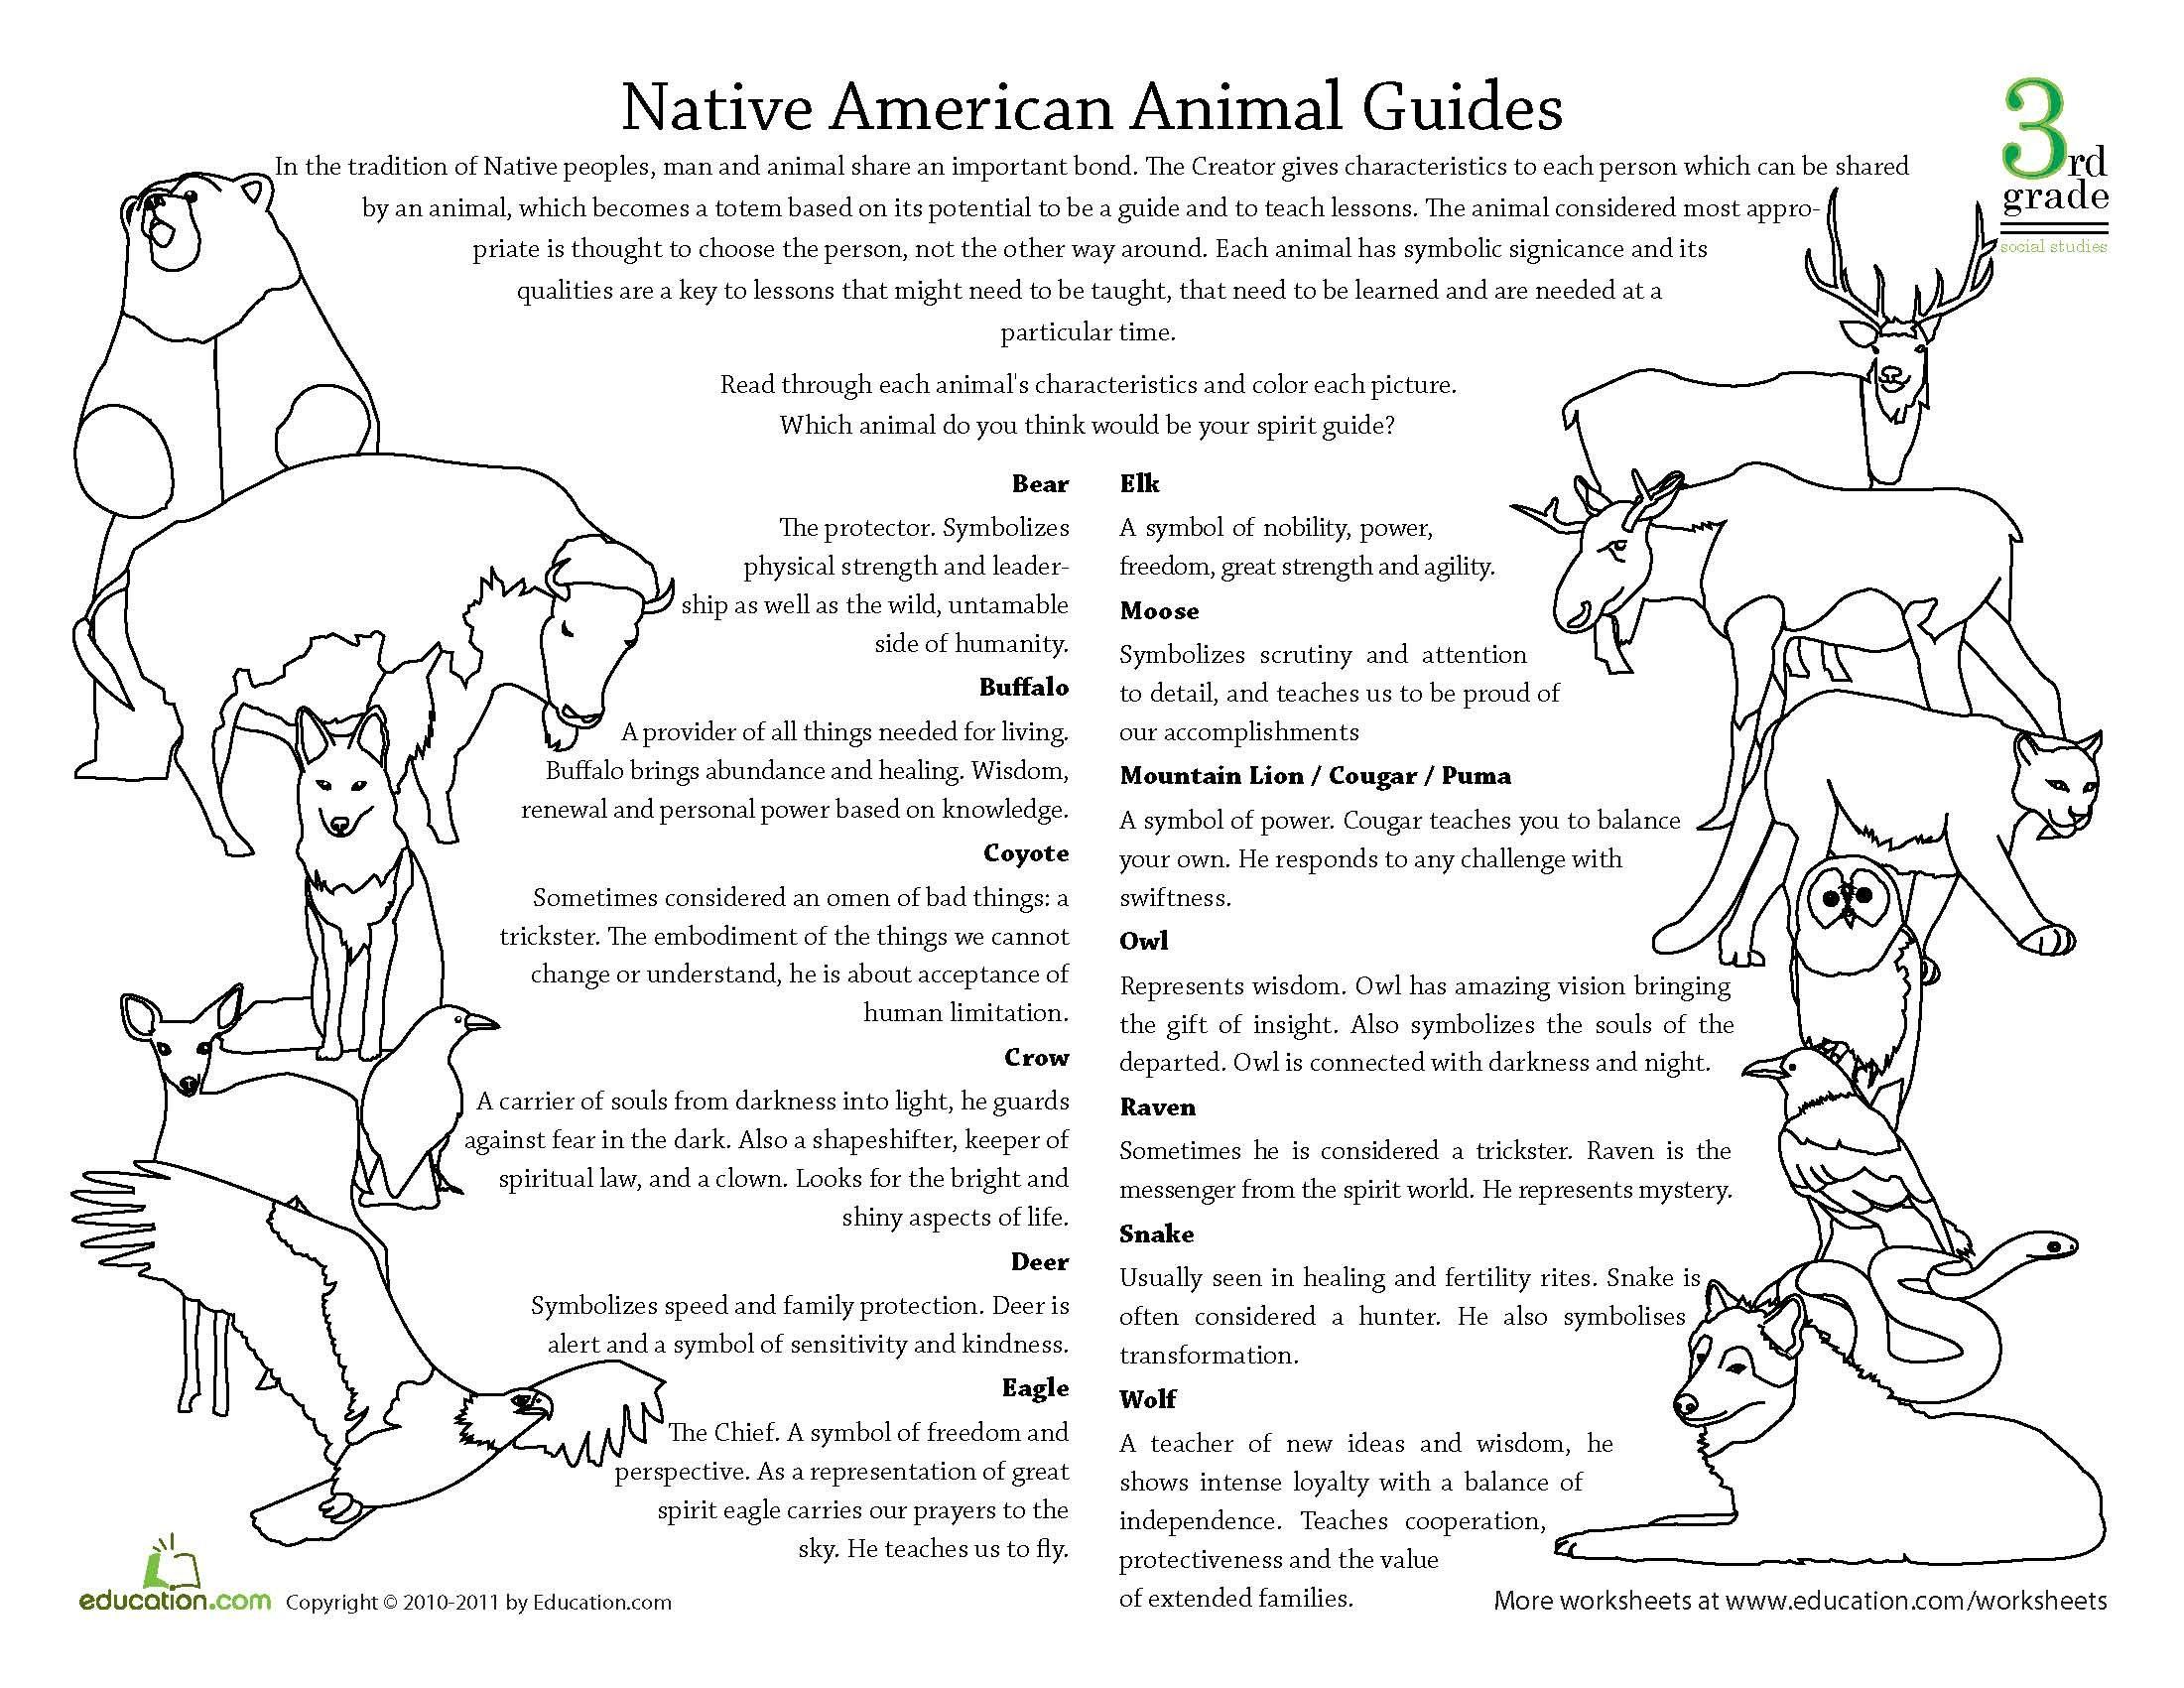 http://api.ning.com/files/7U-JG7rftqSKt-SB74-Nd2vcbytwDfleeO0exFJo1gYdvK0GUwm5e-eLoRXMo…    Native american animals [ 1701 x 2201 Pixel ]